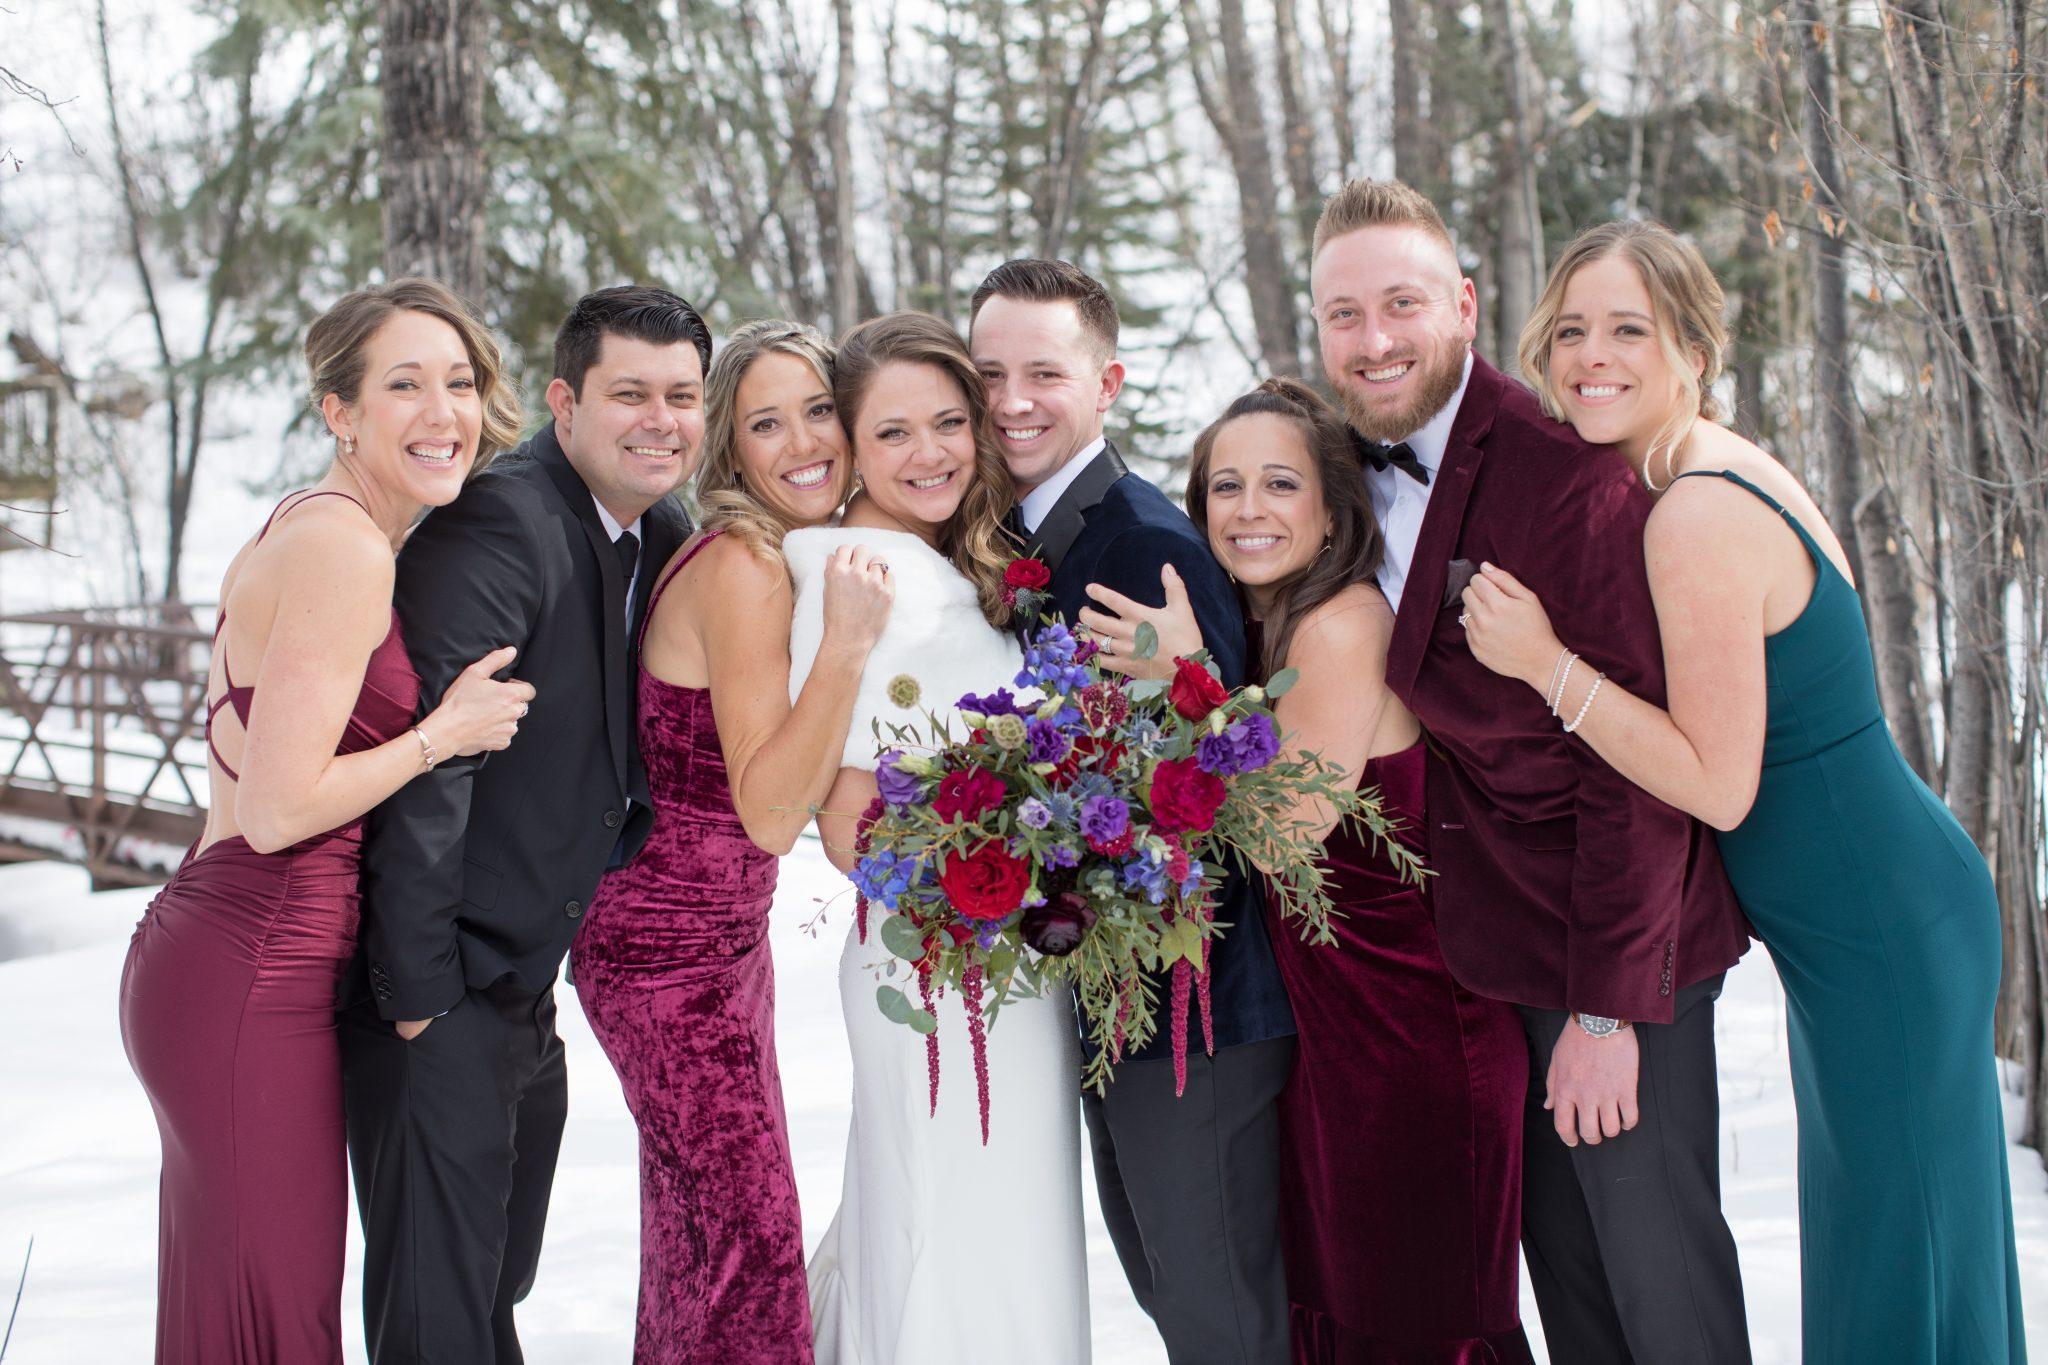 beaver creek winter wedding photographer bridal party